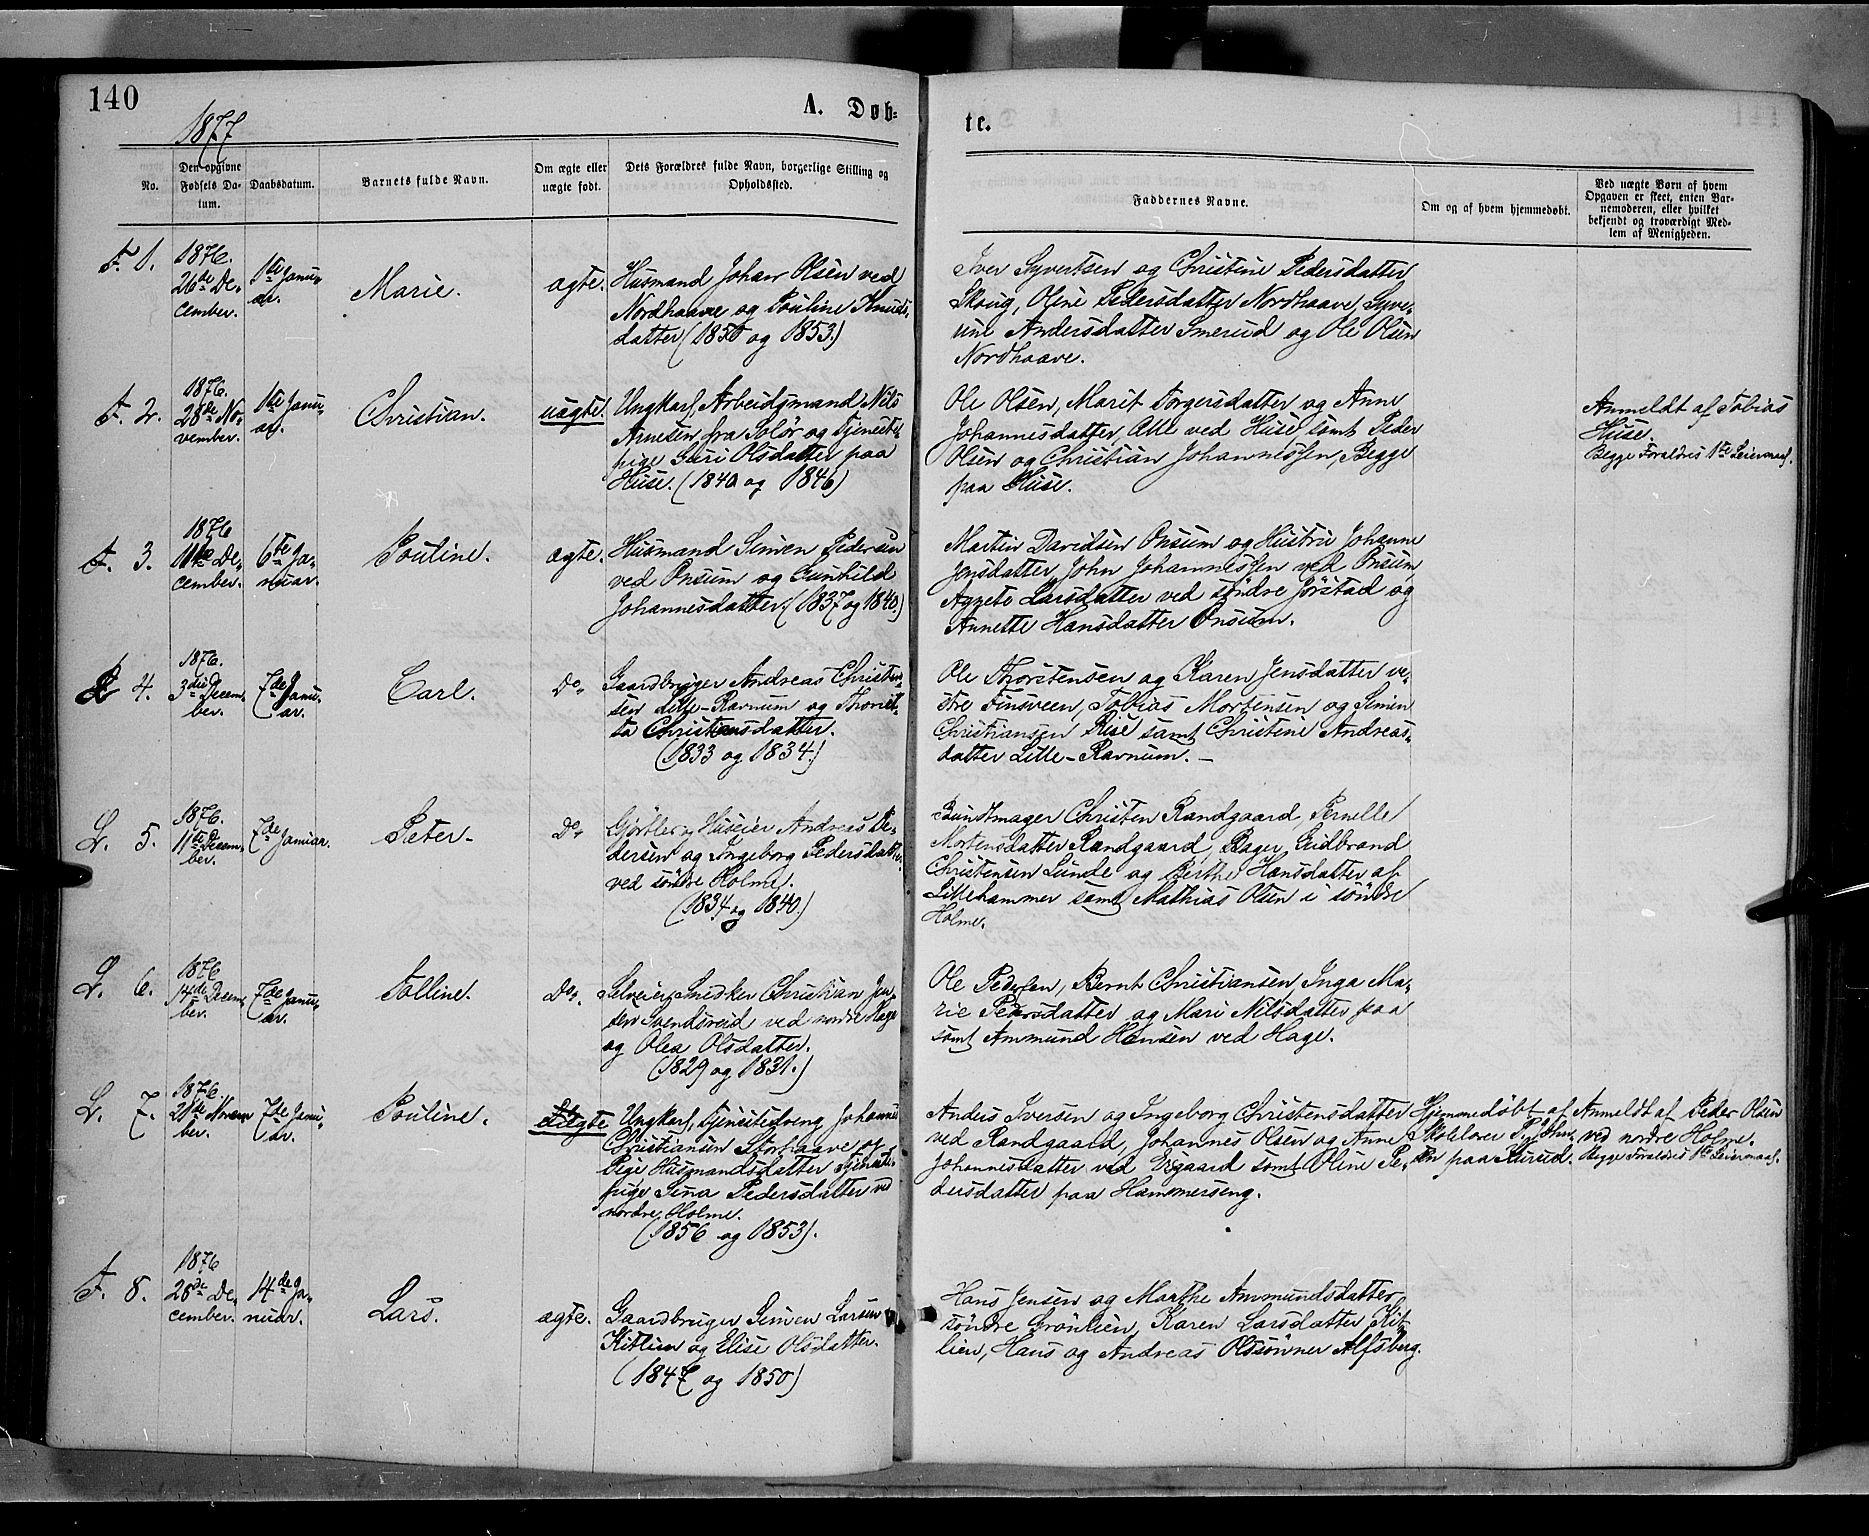 SAH, Fåberg prestekontor, Ministerialbok nr. 7, 1868-1878, s. 140